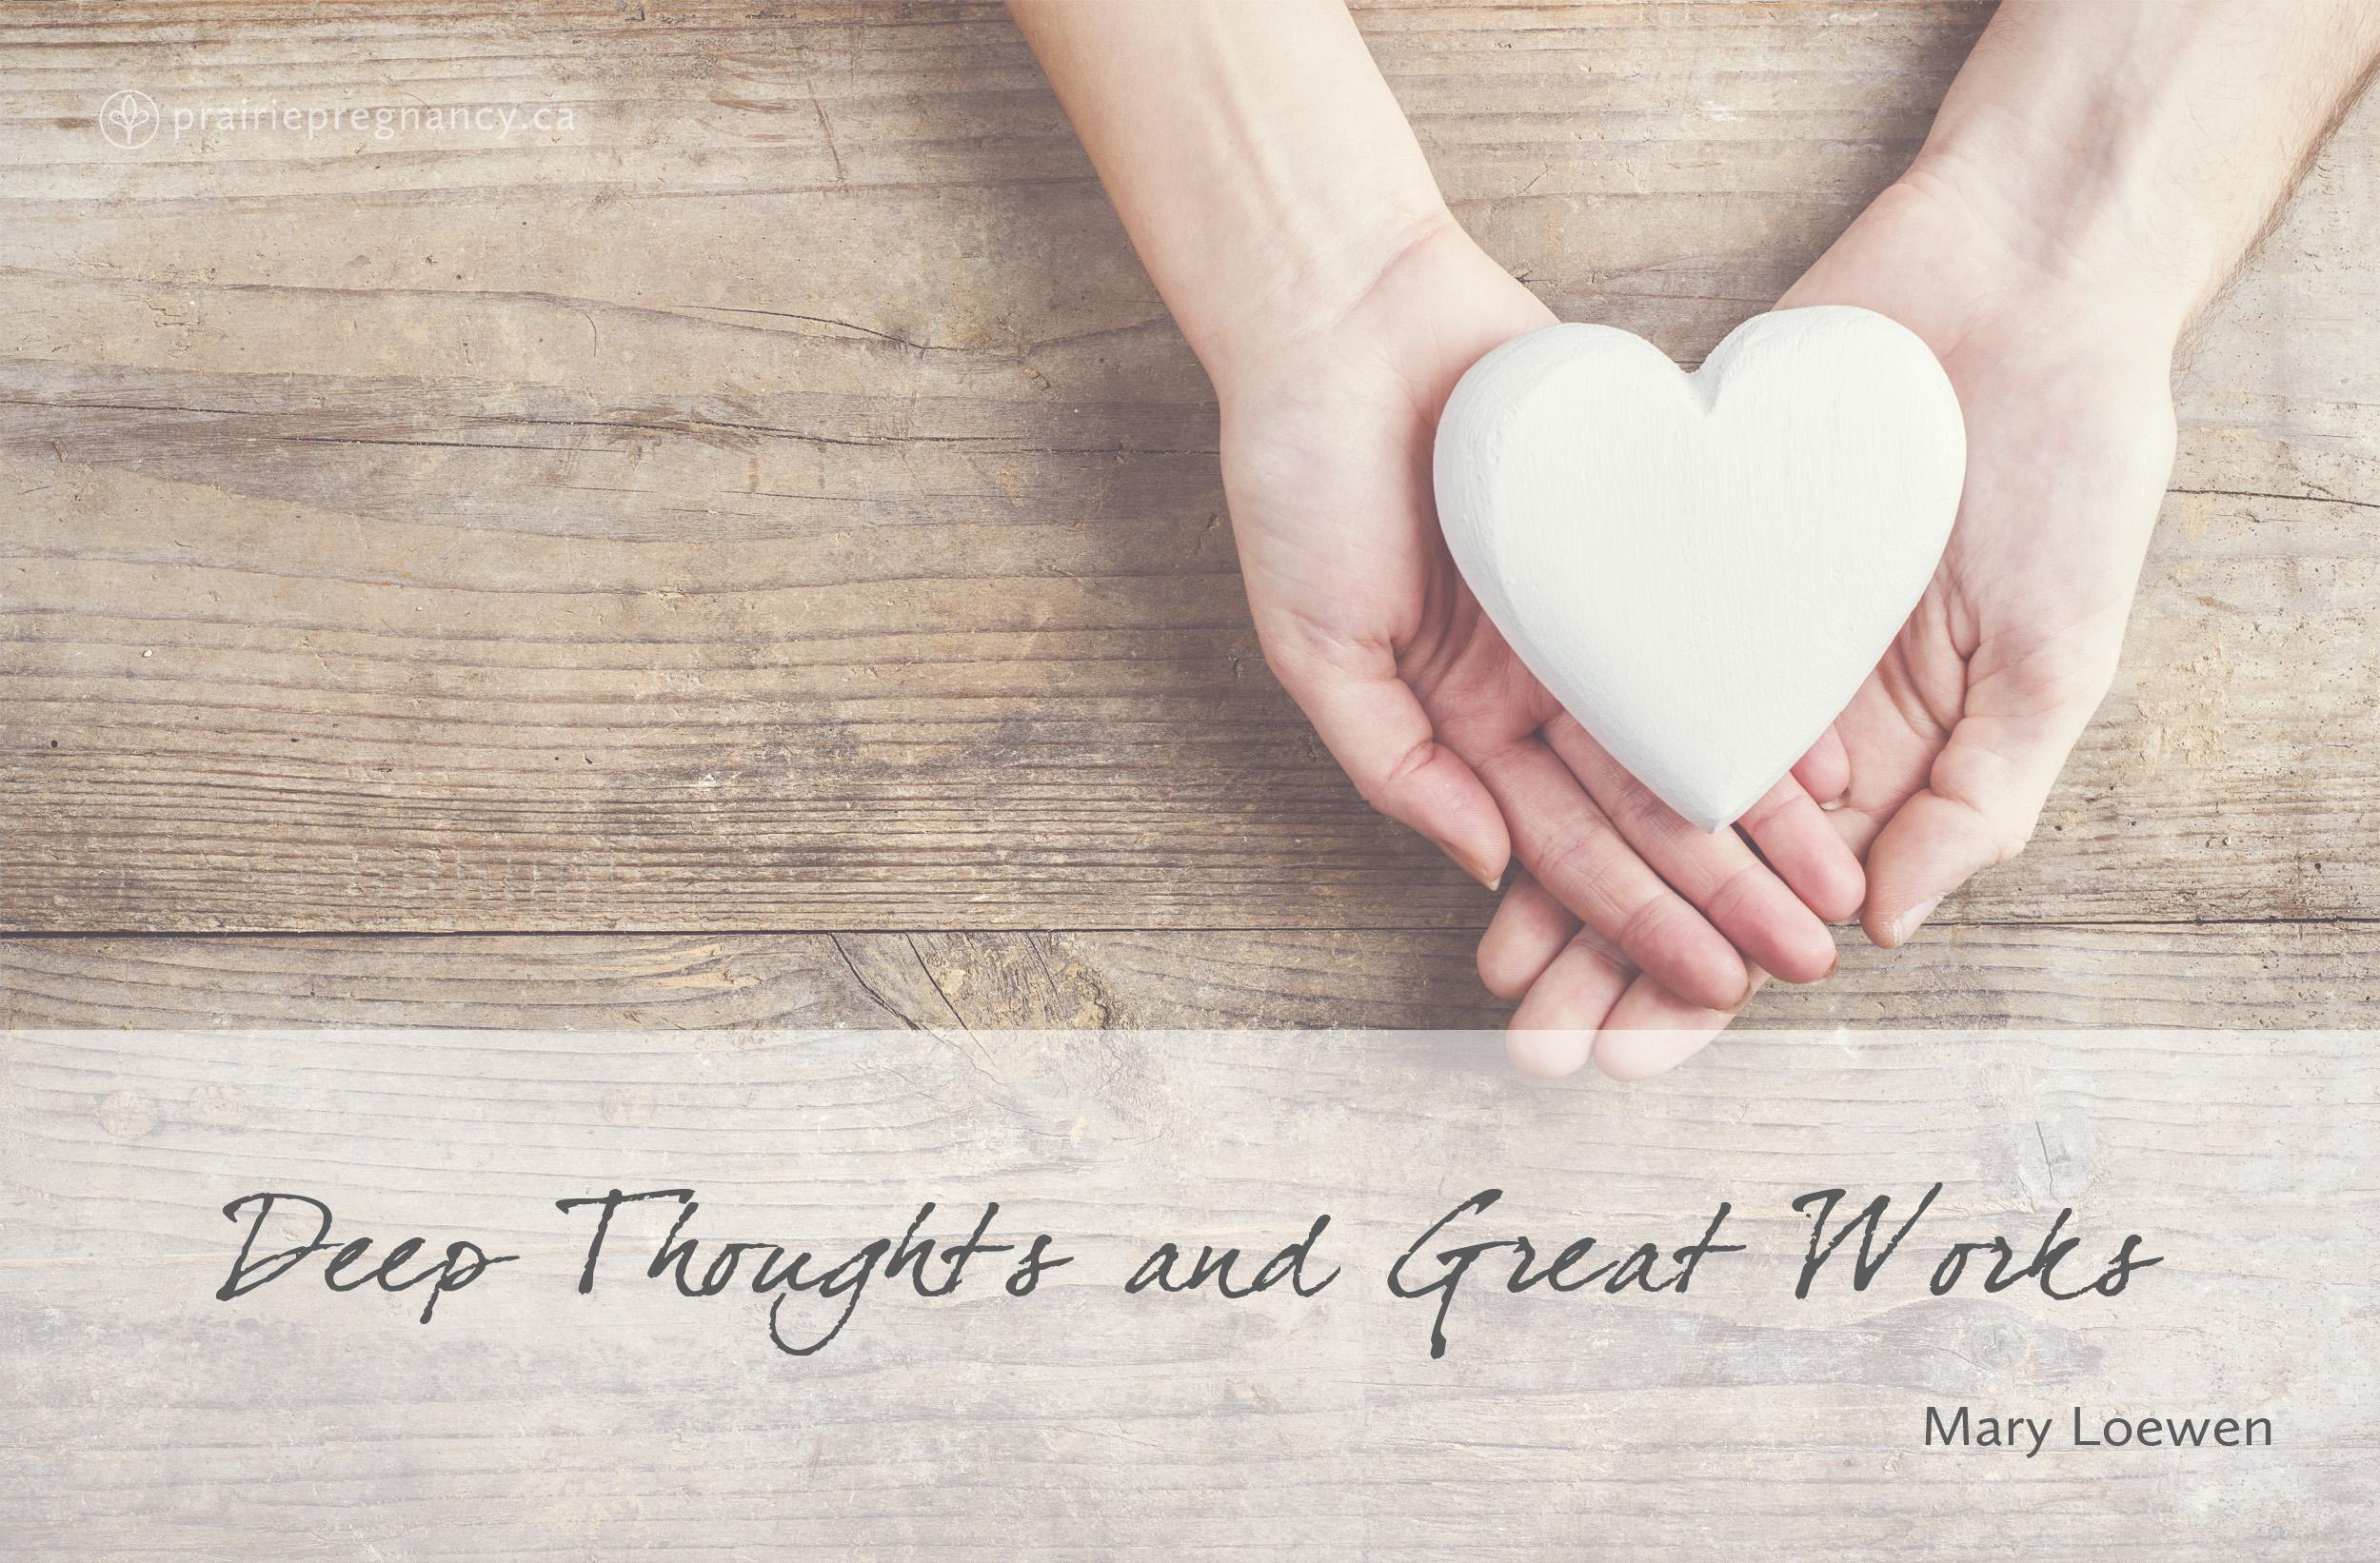 deep thoughts great works prairie pregnancy support manitoba blog.jpg